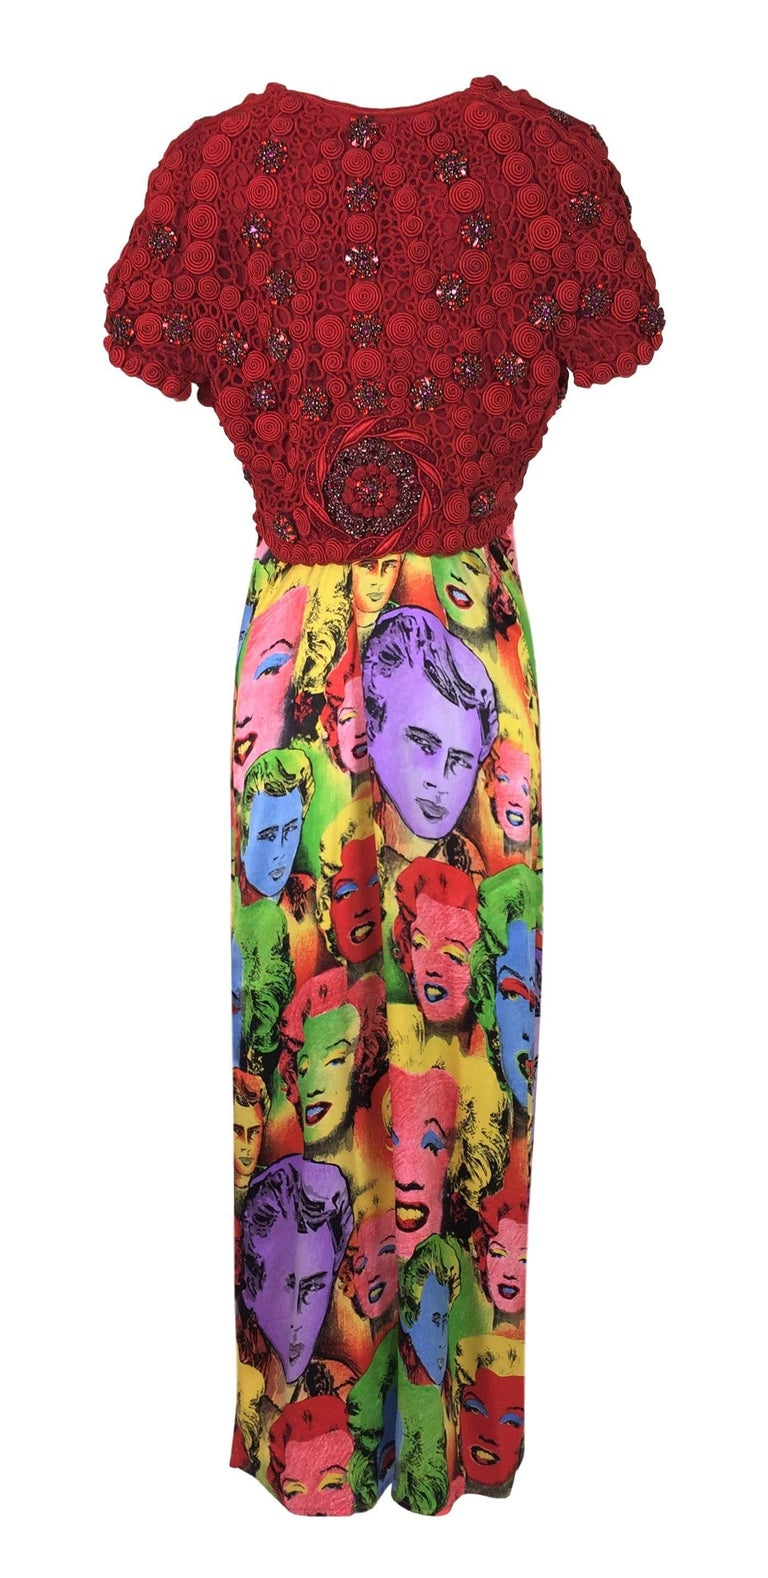 fec848e433 Gianni Versace Marilyn Monroe Andy Warhol Plunging Silk Slip Dress, S / S  1991